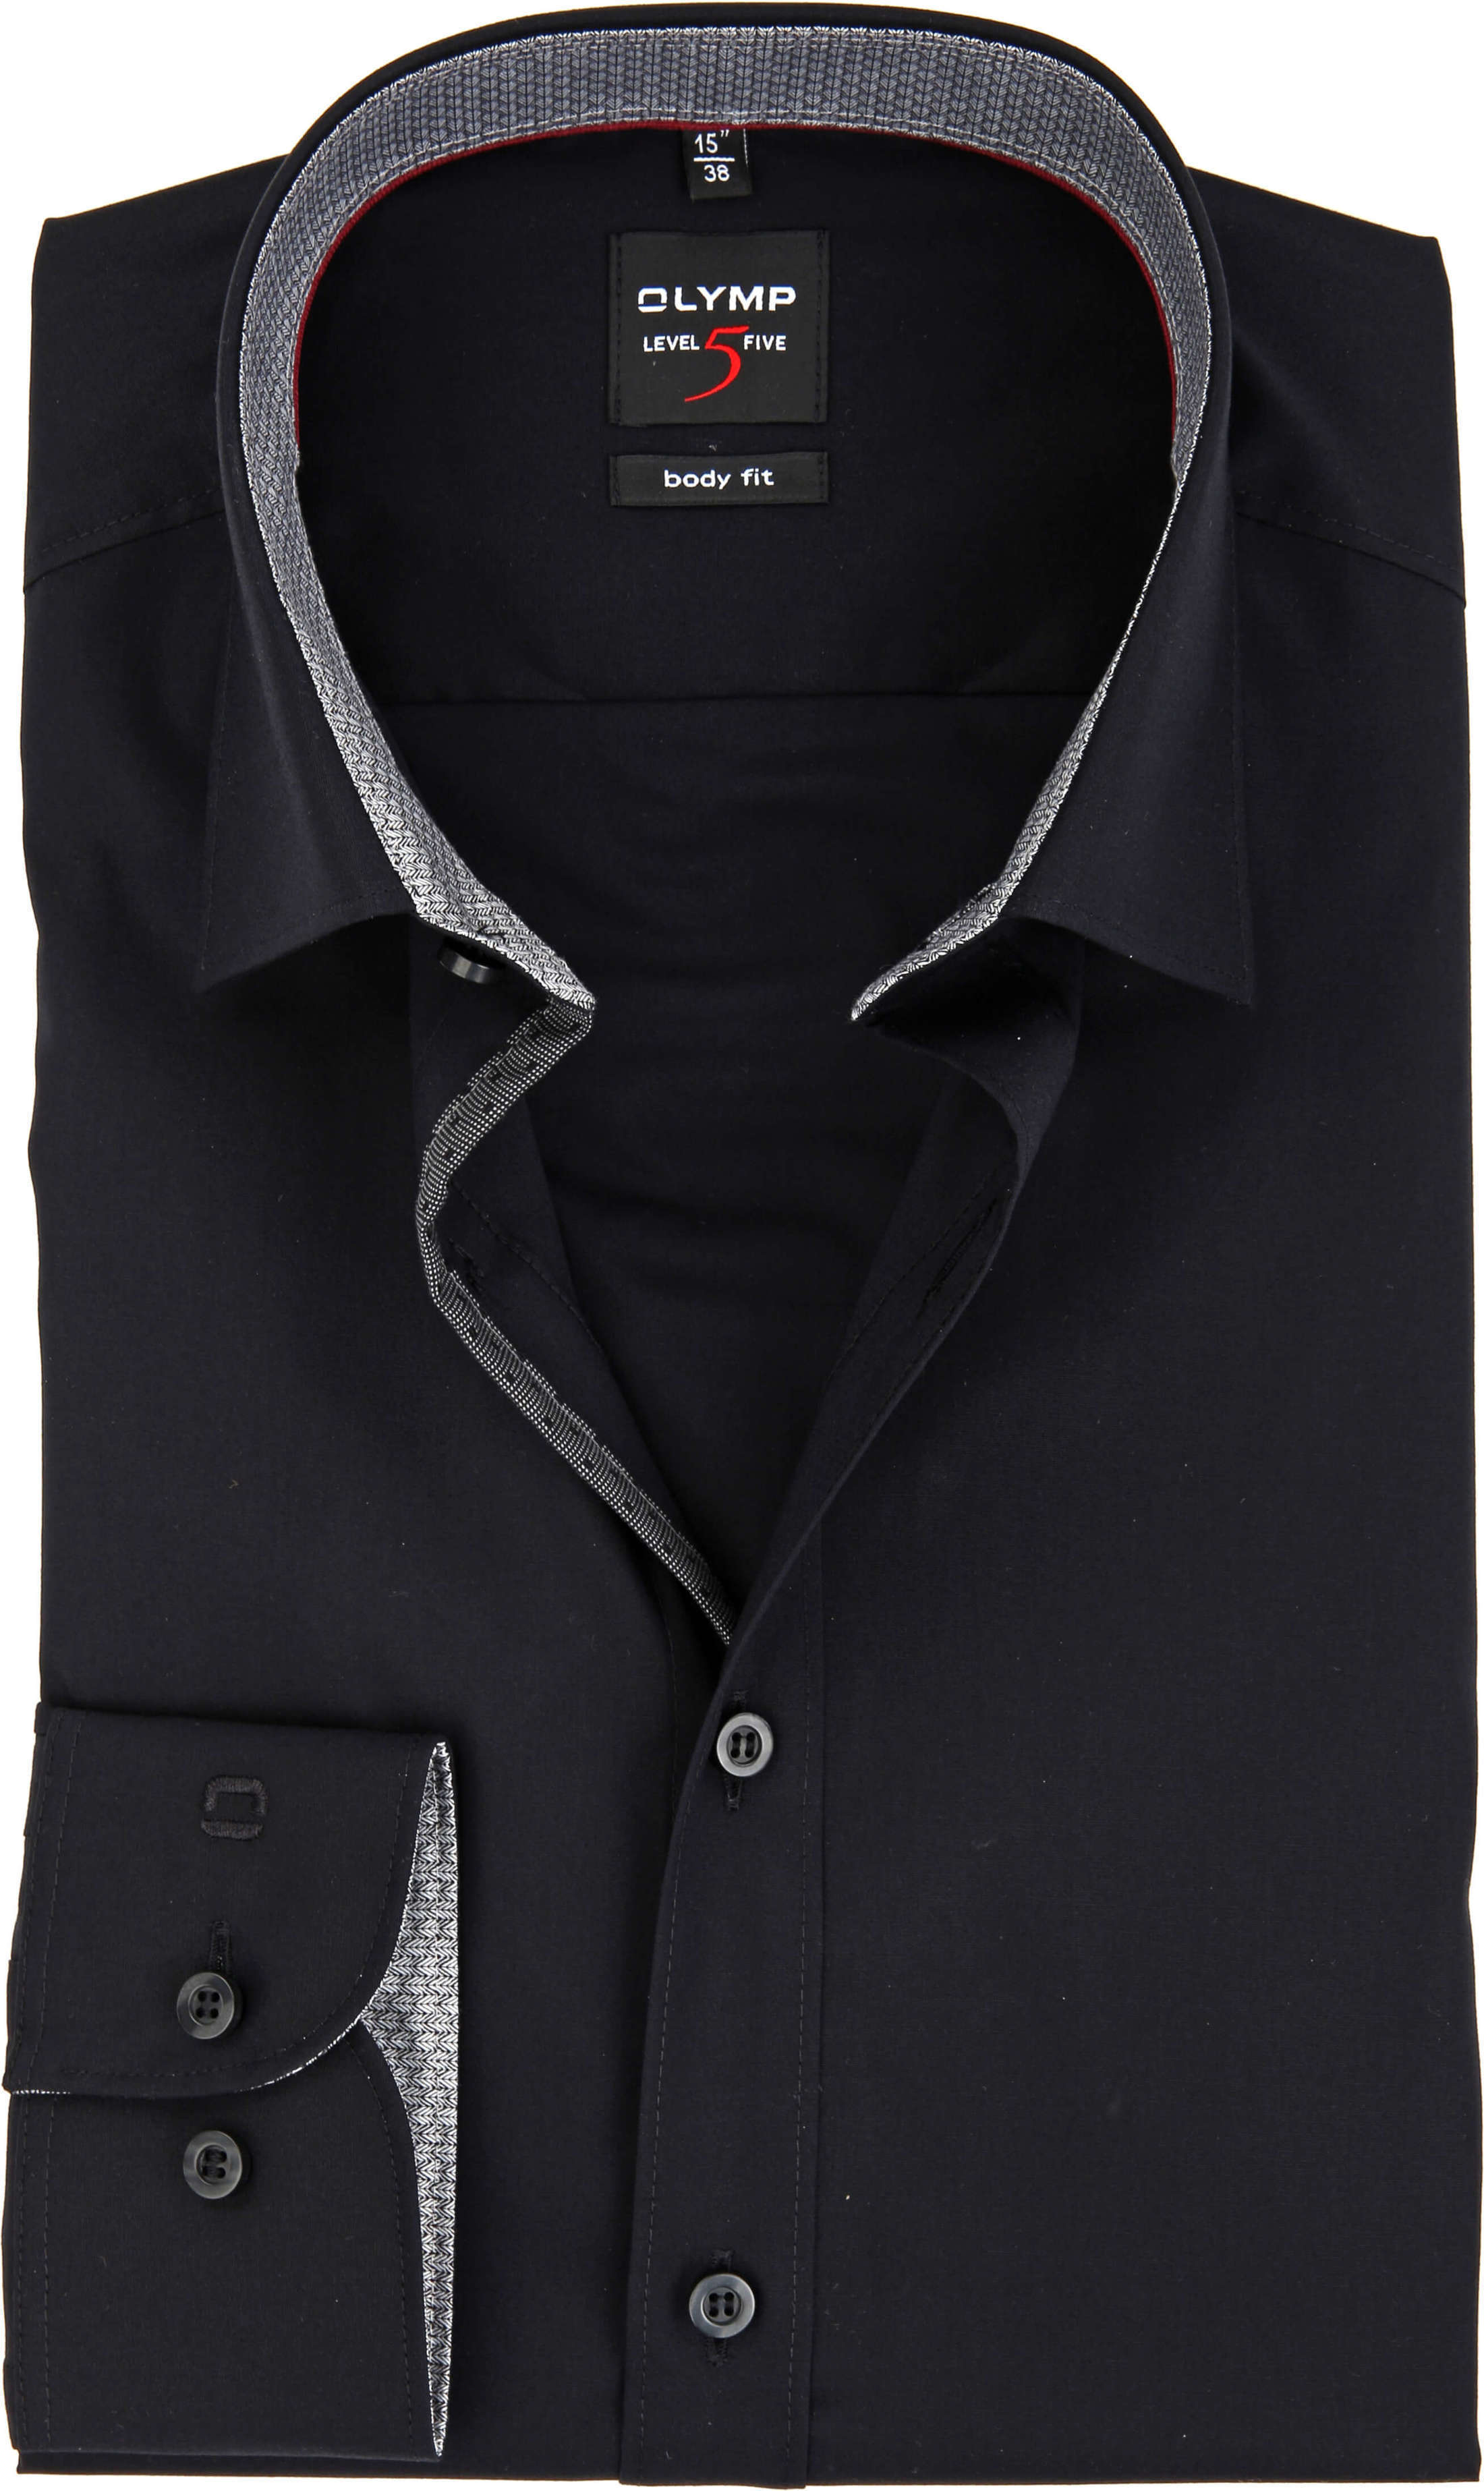 OLYMP Overhemd Level 5 Body Fit Zwart foto 0